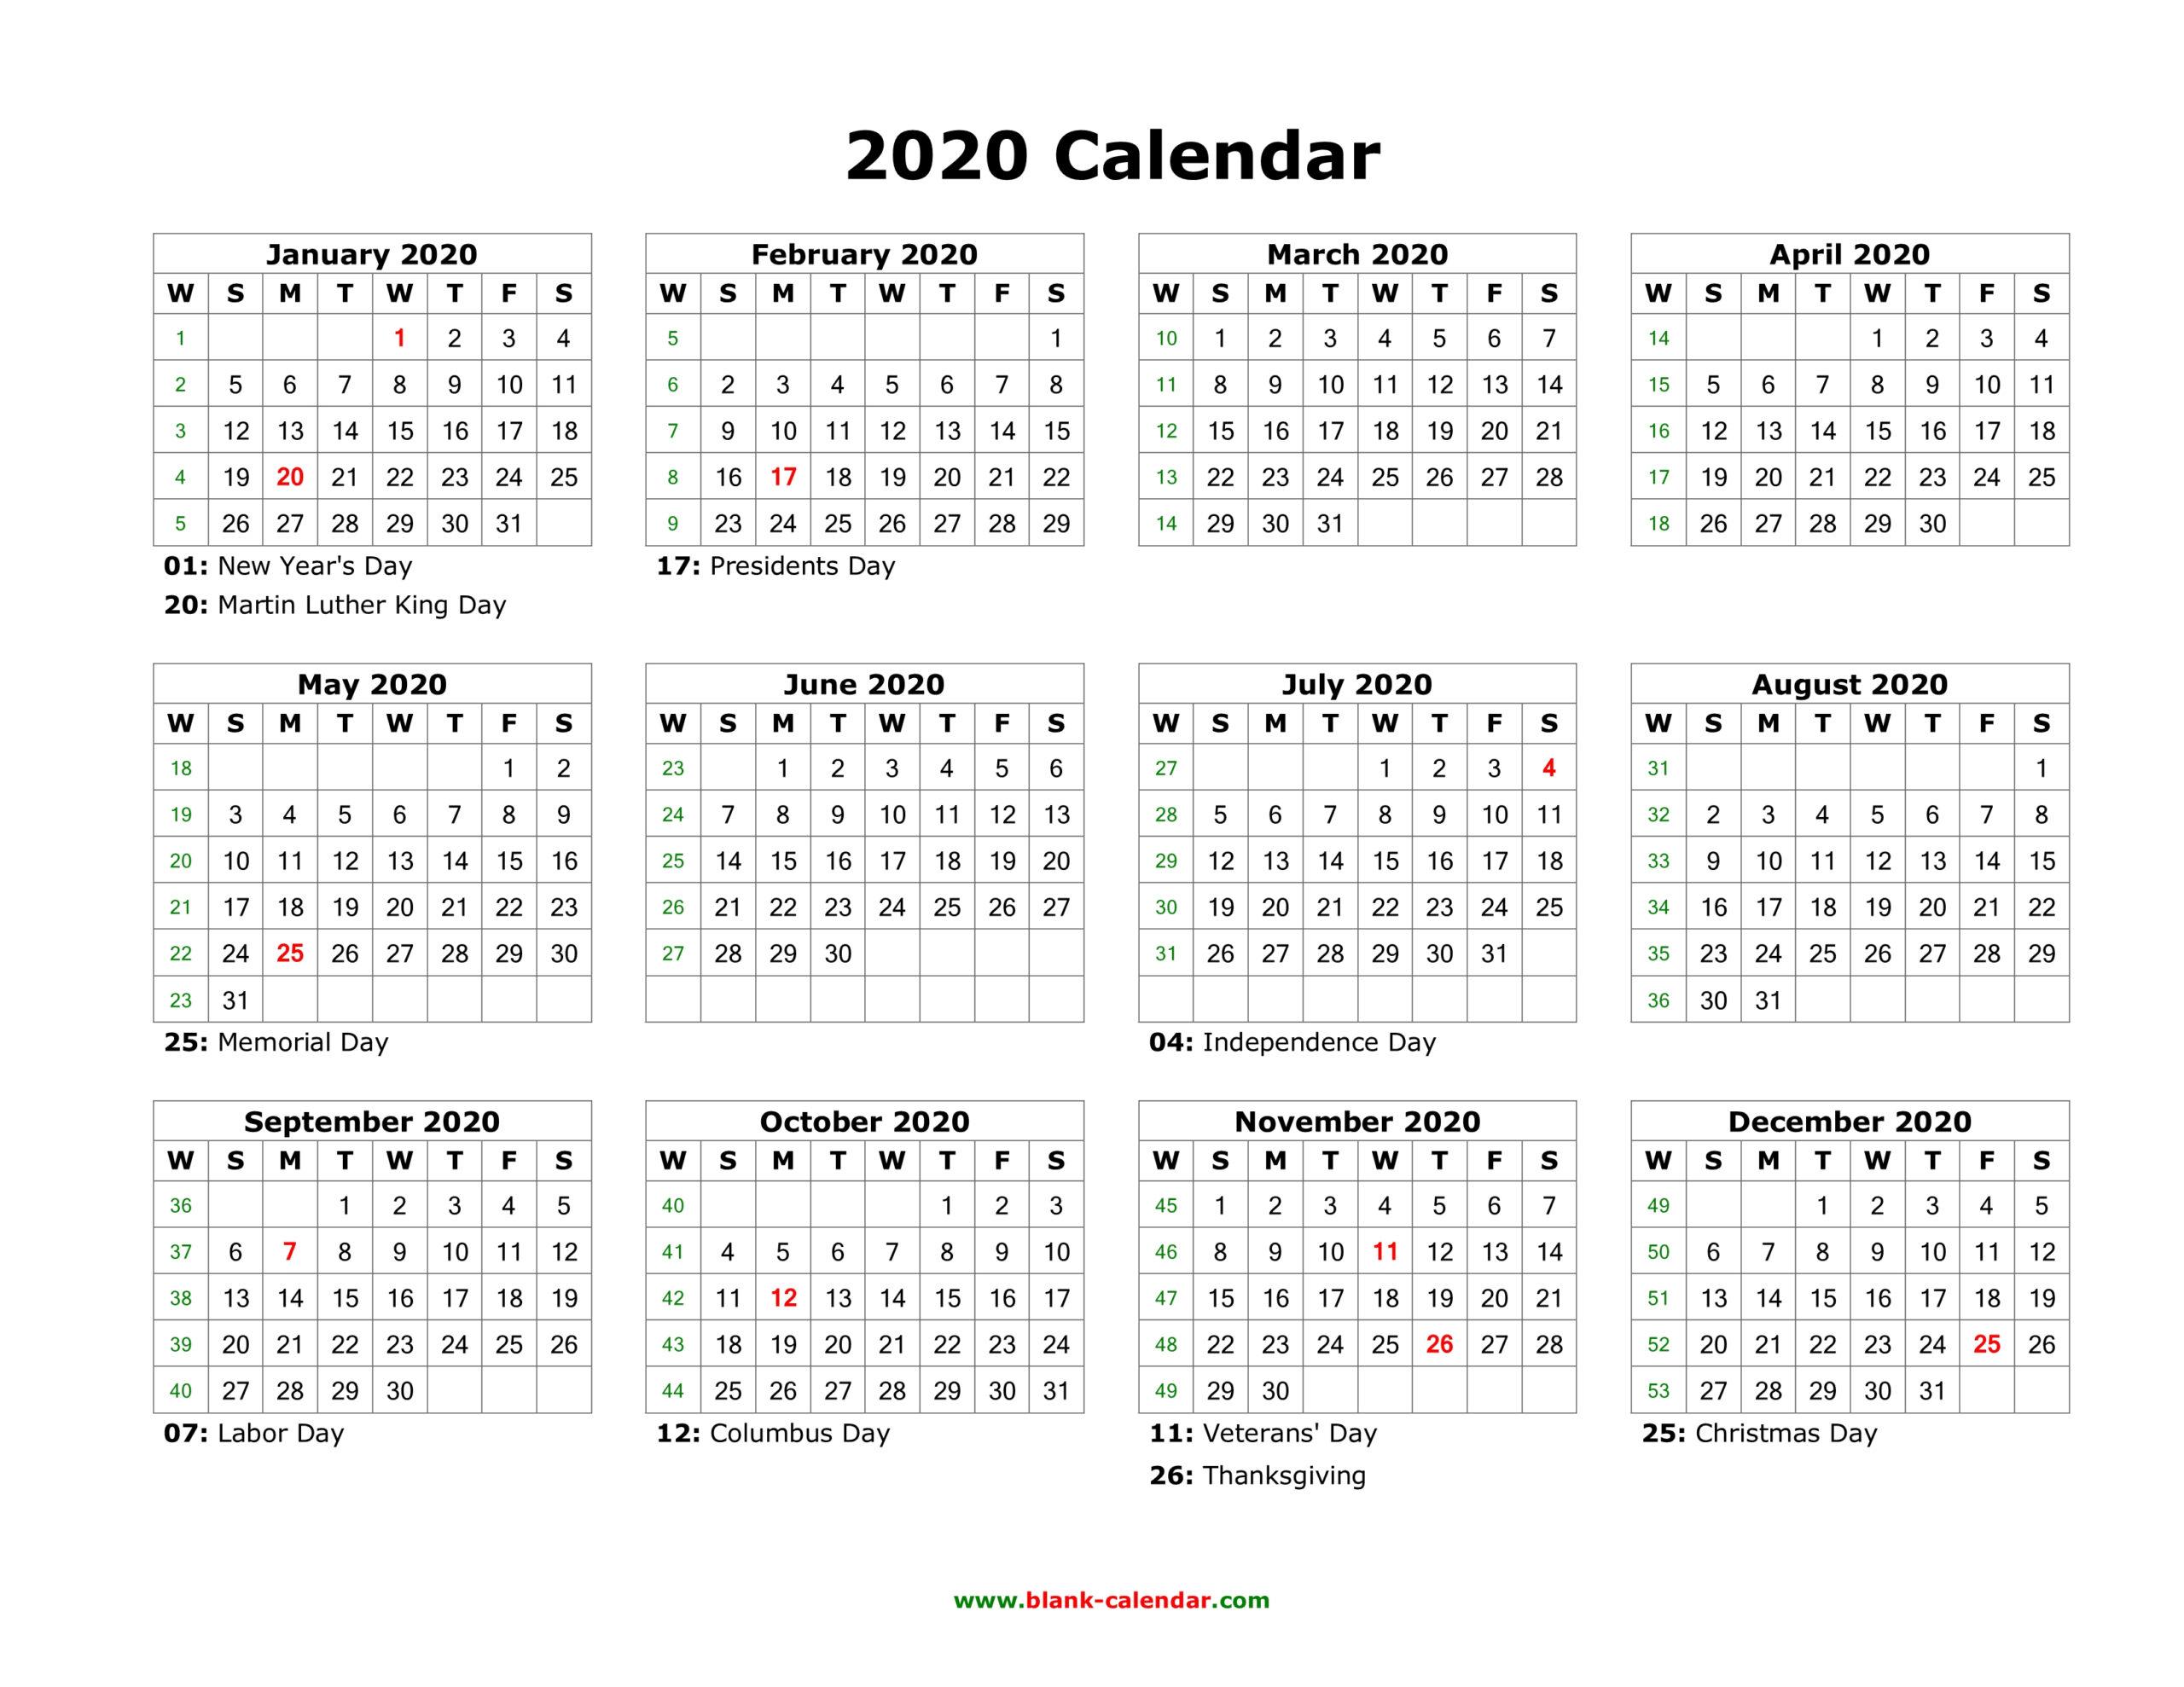 Free Printable Calendar For 2020 | Printable Calendar 2020